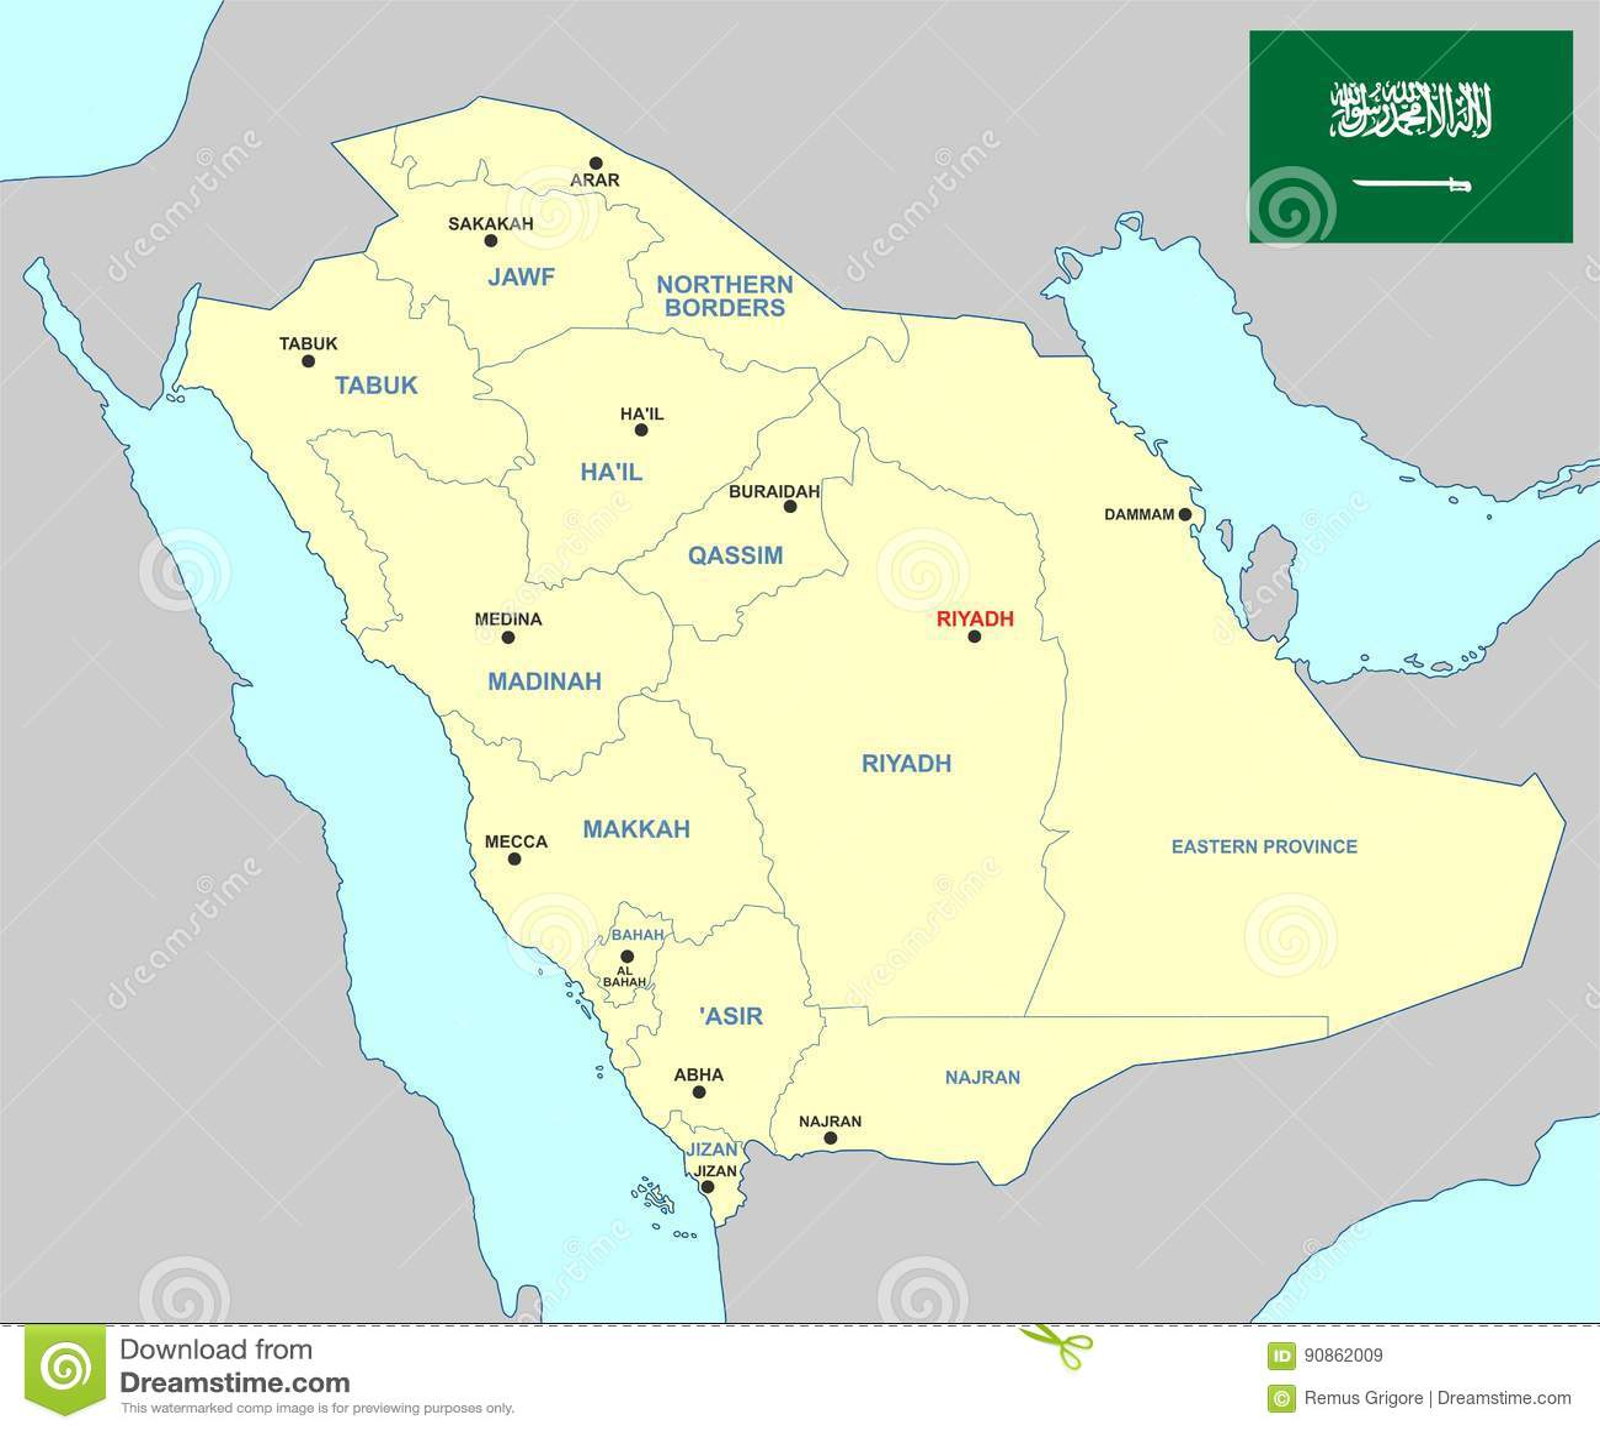 Saudi Arabia Map - Cdr Format Stock Vector - Illustration of riyadh ...